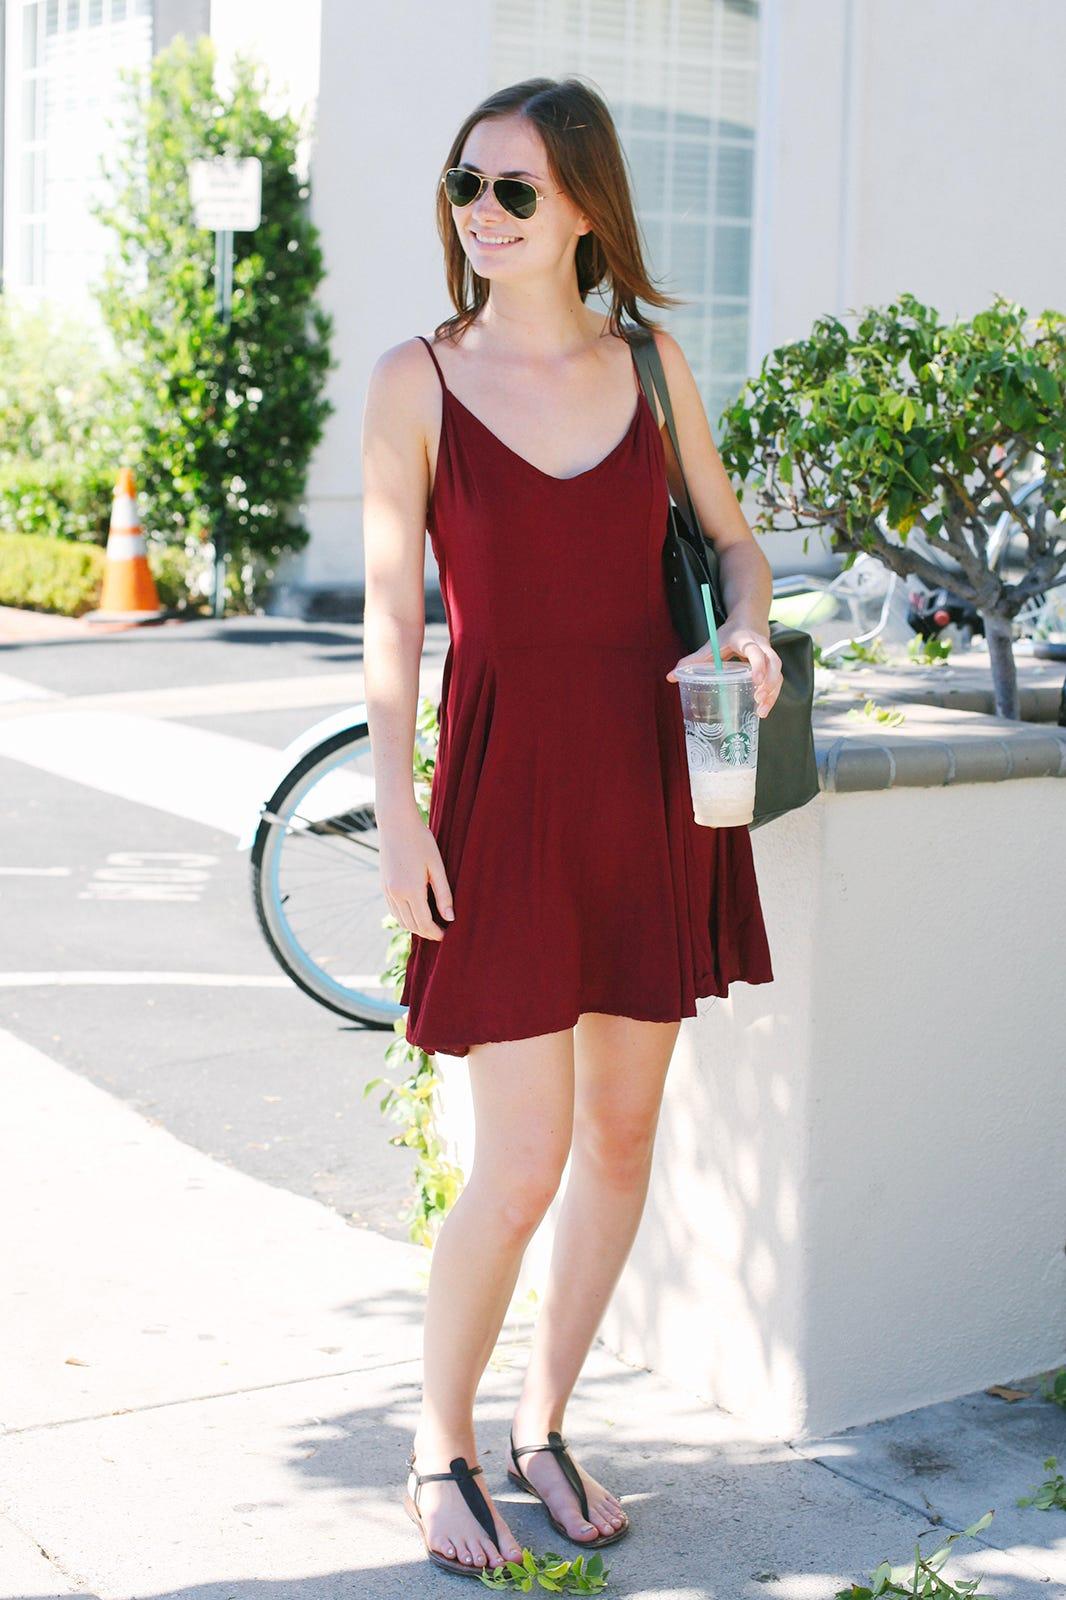 Street Style - College, Los Angeles, USC, UCLA, Fashion